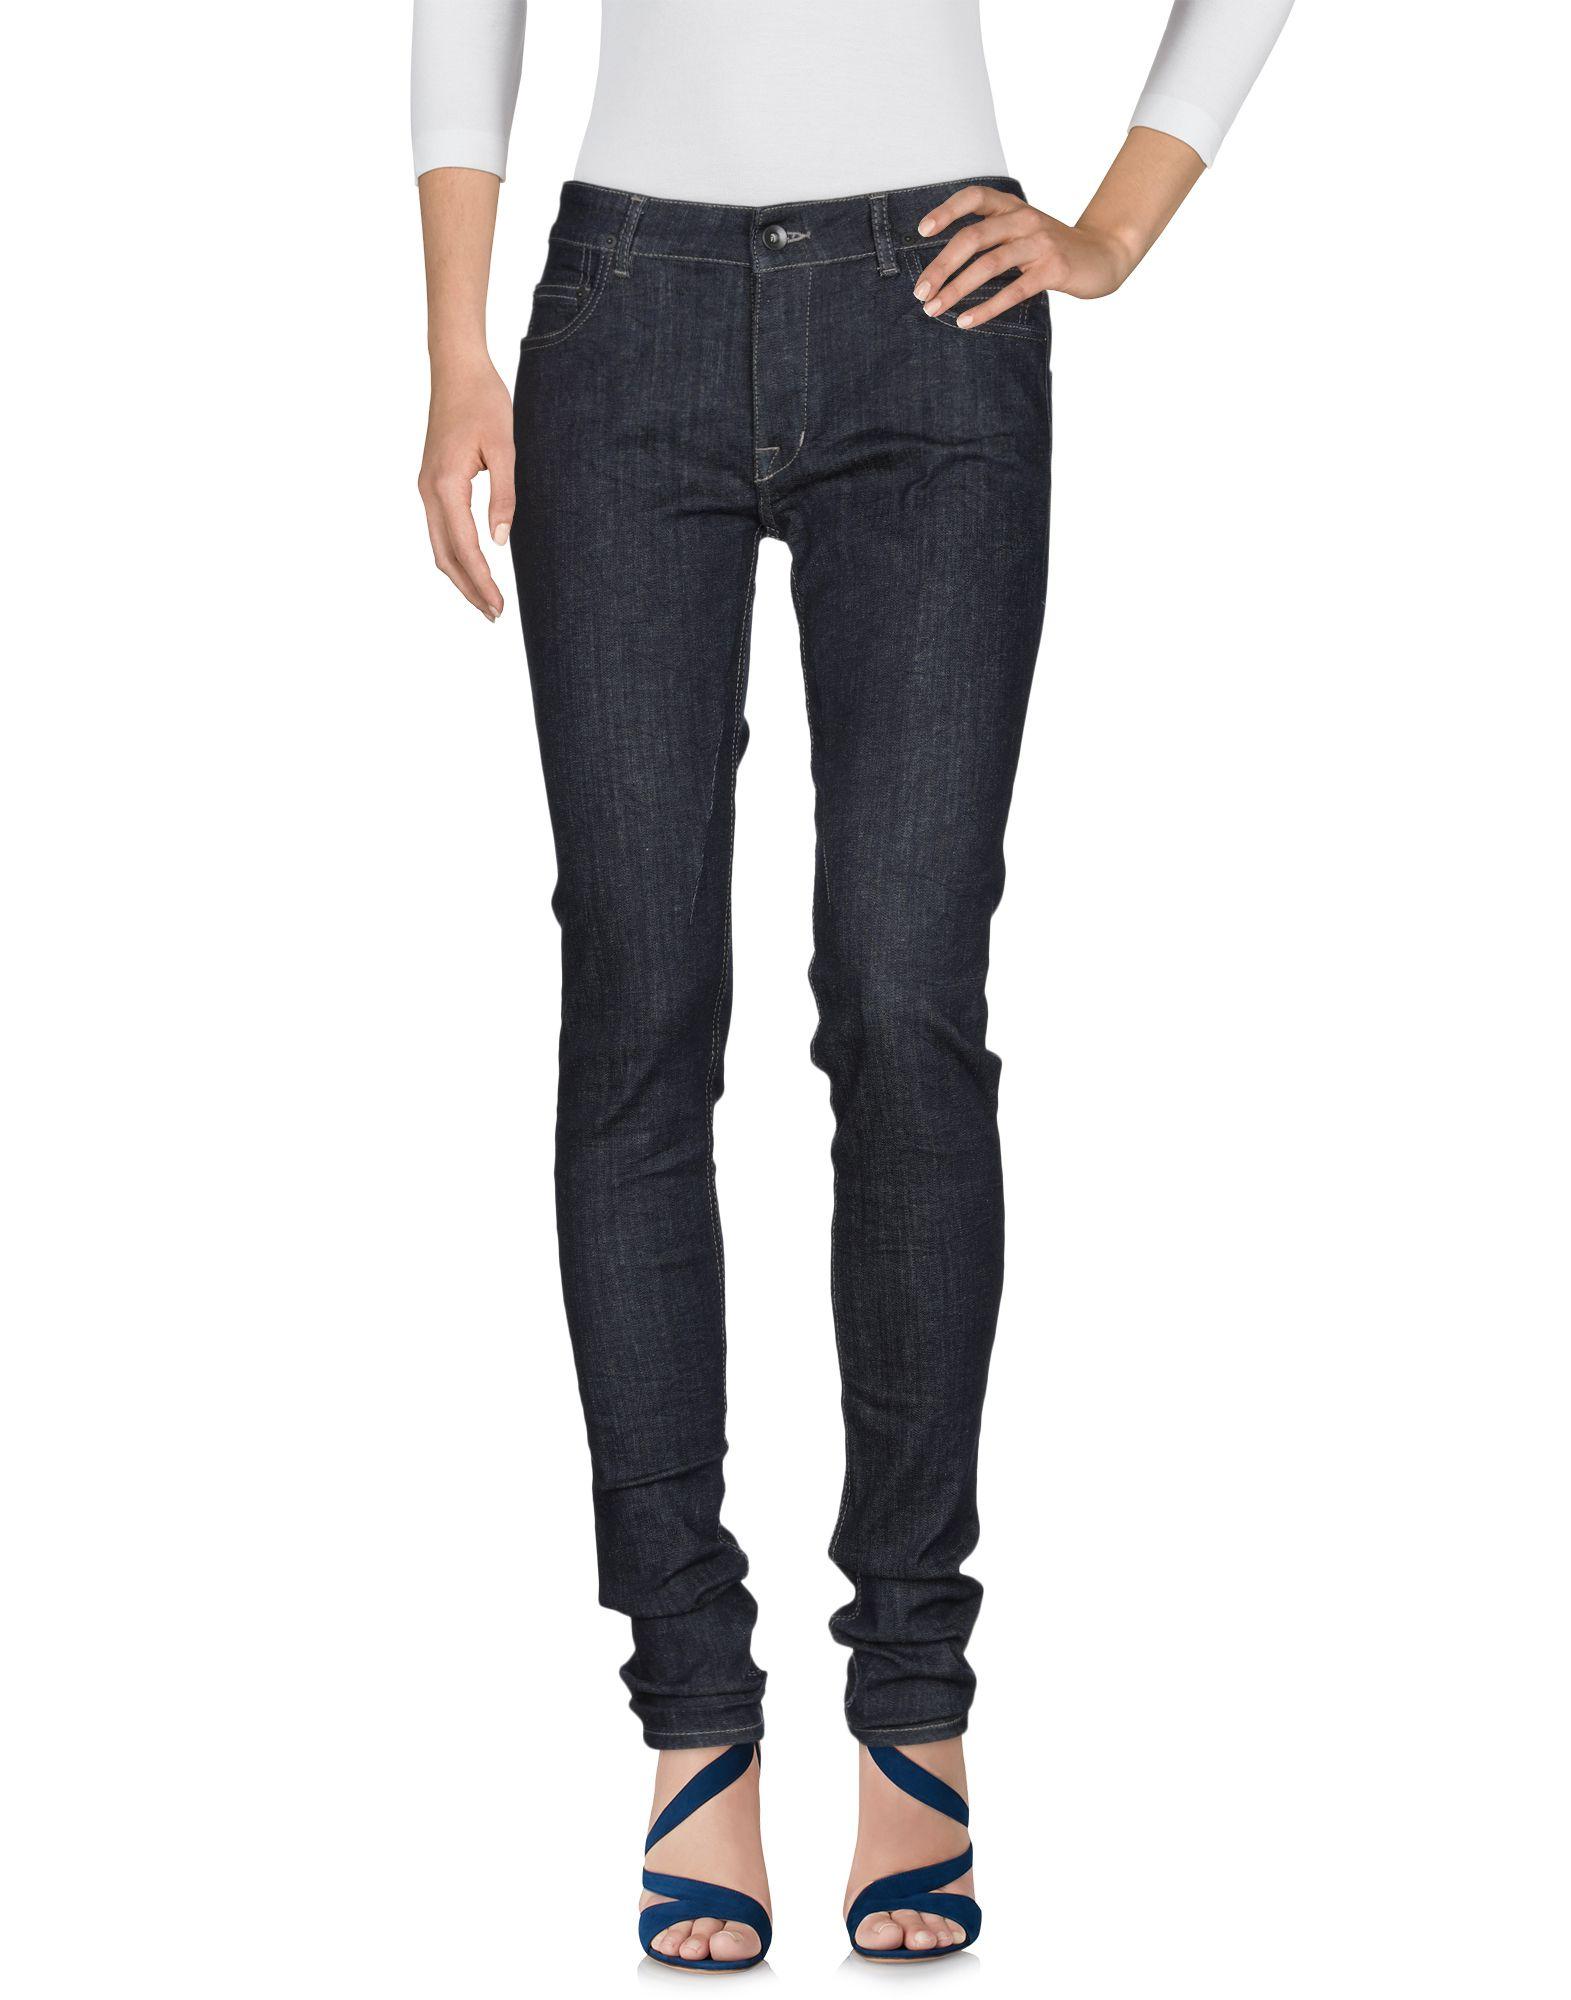 Pantaloni Jeans Drkshdw By Rick Owens Donna - Acquista online su K2hiVZepZ